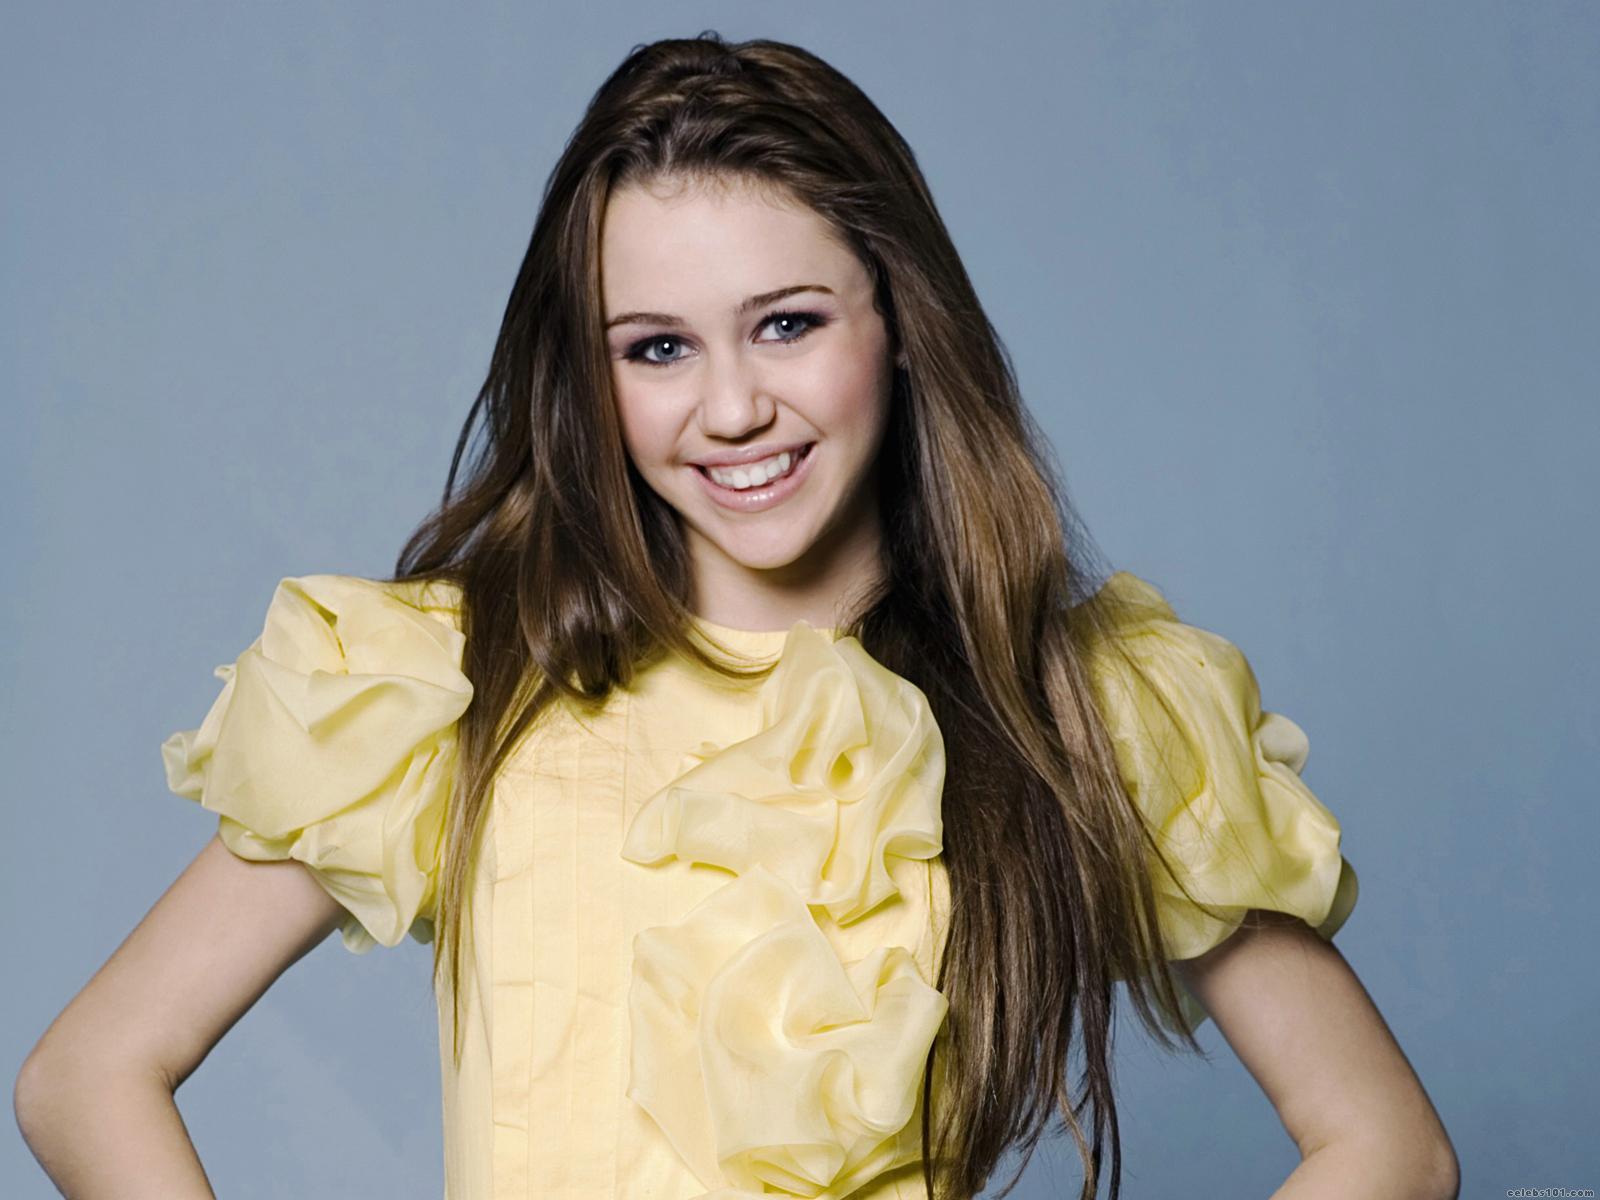 http://2.bp.blogspot.com/-EWq-nMASG_Q/Tbnbbv-MZhI/AAAAAAAADM8/JWiJzVyXiLU/s1600/Miley_Cyrus_Hannah_Montana_Wallpaper.jpg